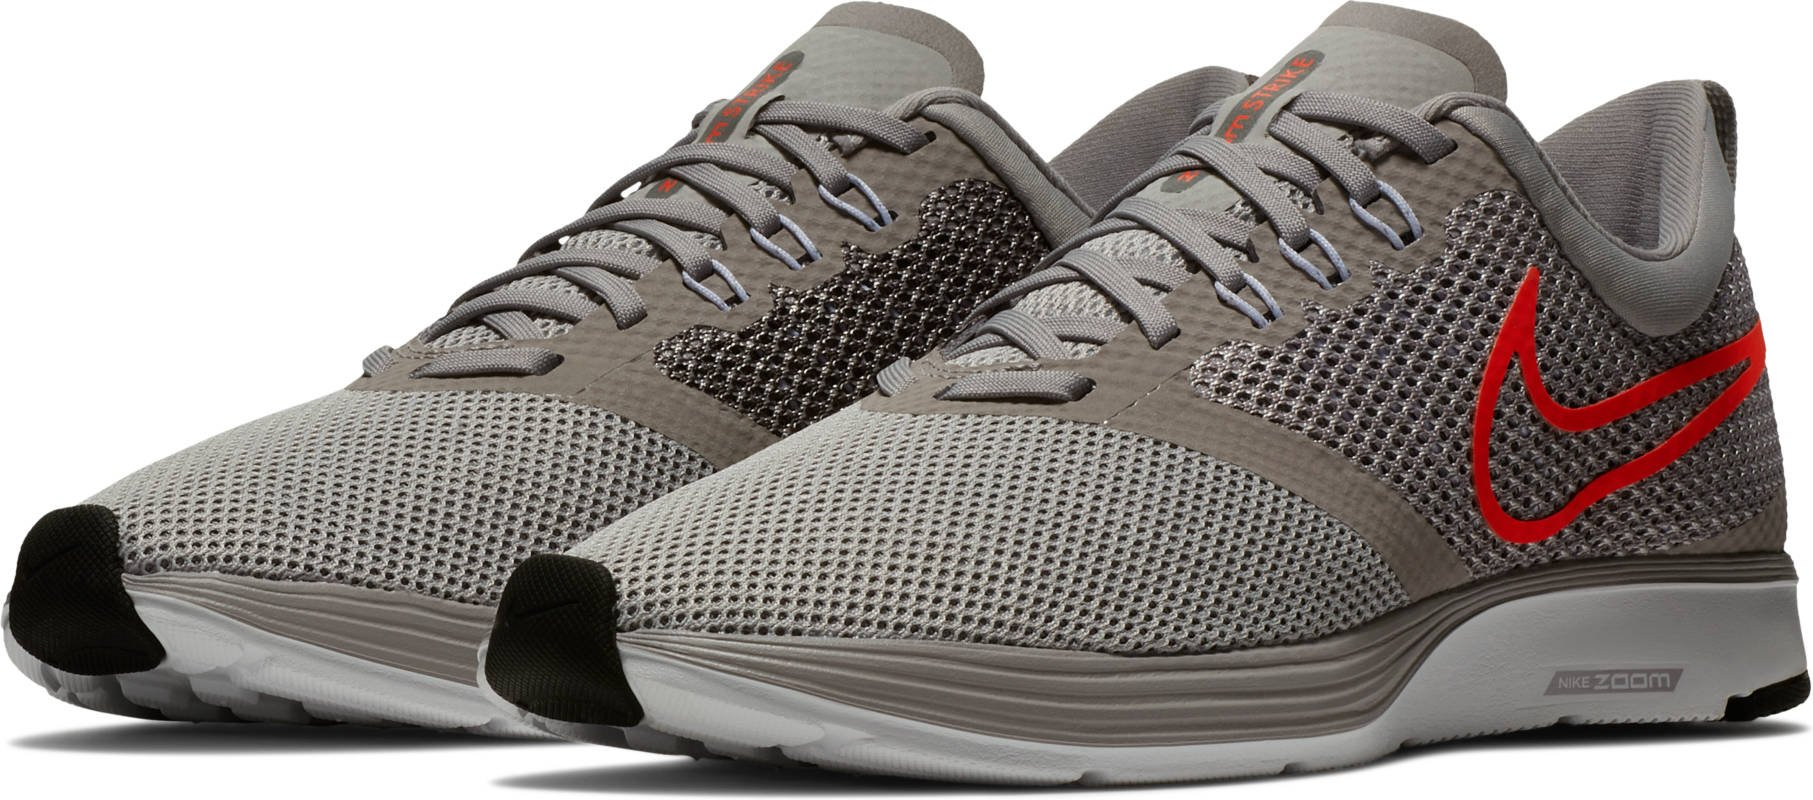 c9604626e29ce Nike Zoom Strike (7, Atmosphere Grey/Total Crimson/Vast Grey/Gun  Smoke/White/Black)